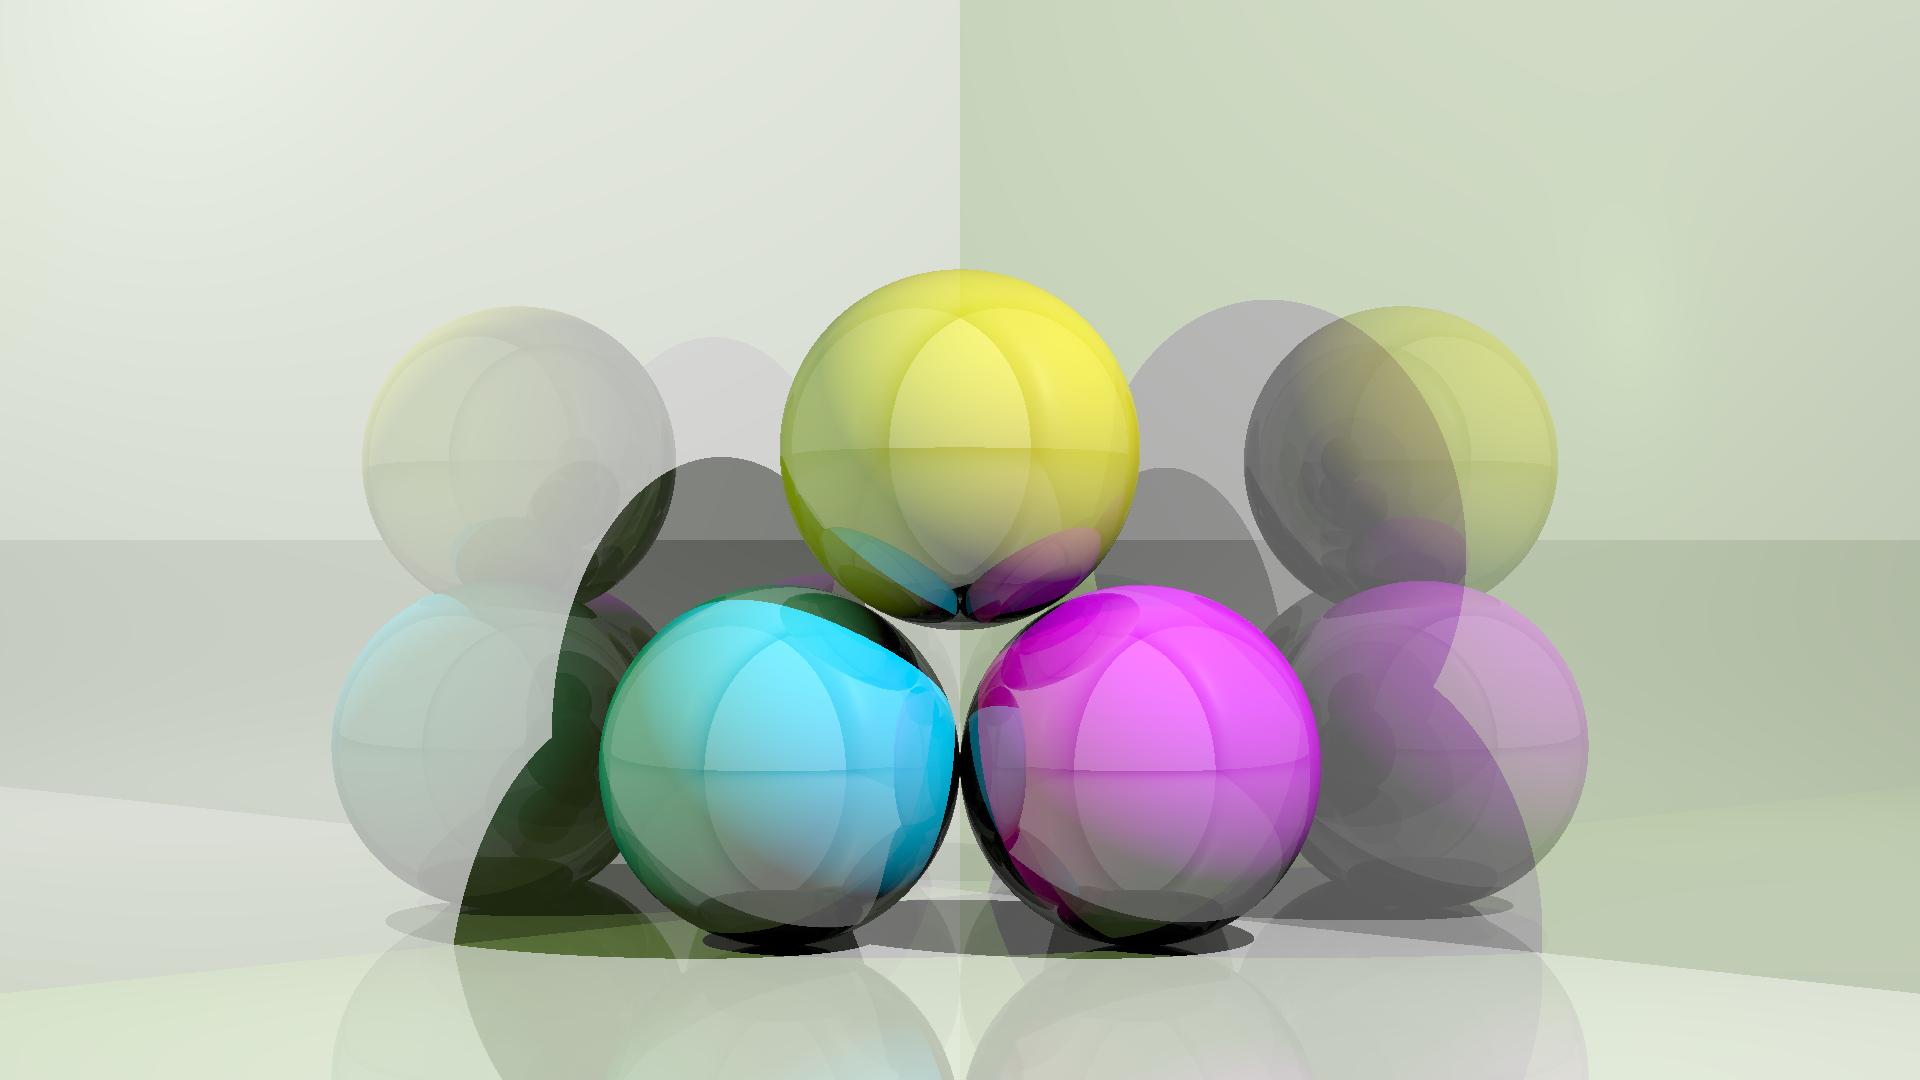 Sample Luminosity render